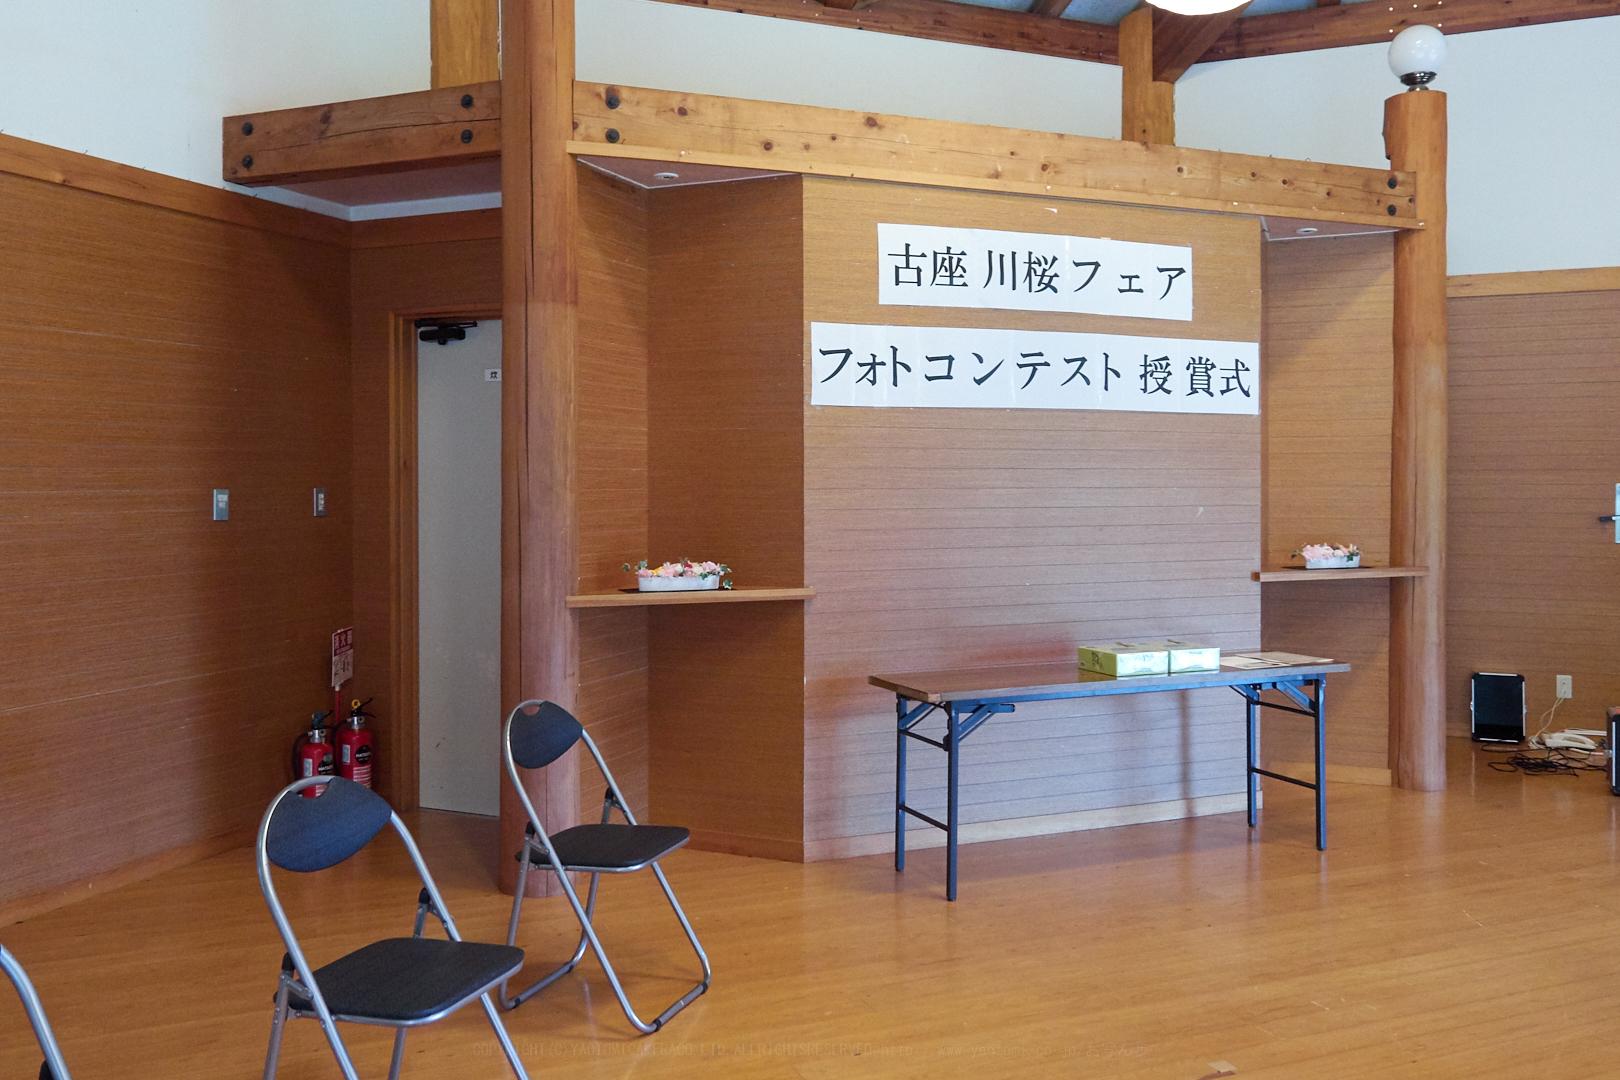 https://www.yaotomi.co.jp/blog/walk/PXZ21058%2C6%20mm%2CF2.8%2Ciso640.jpg